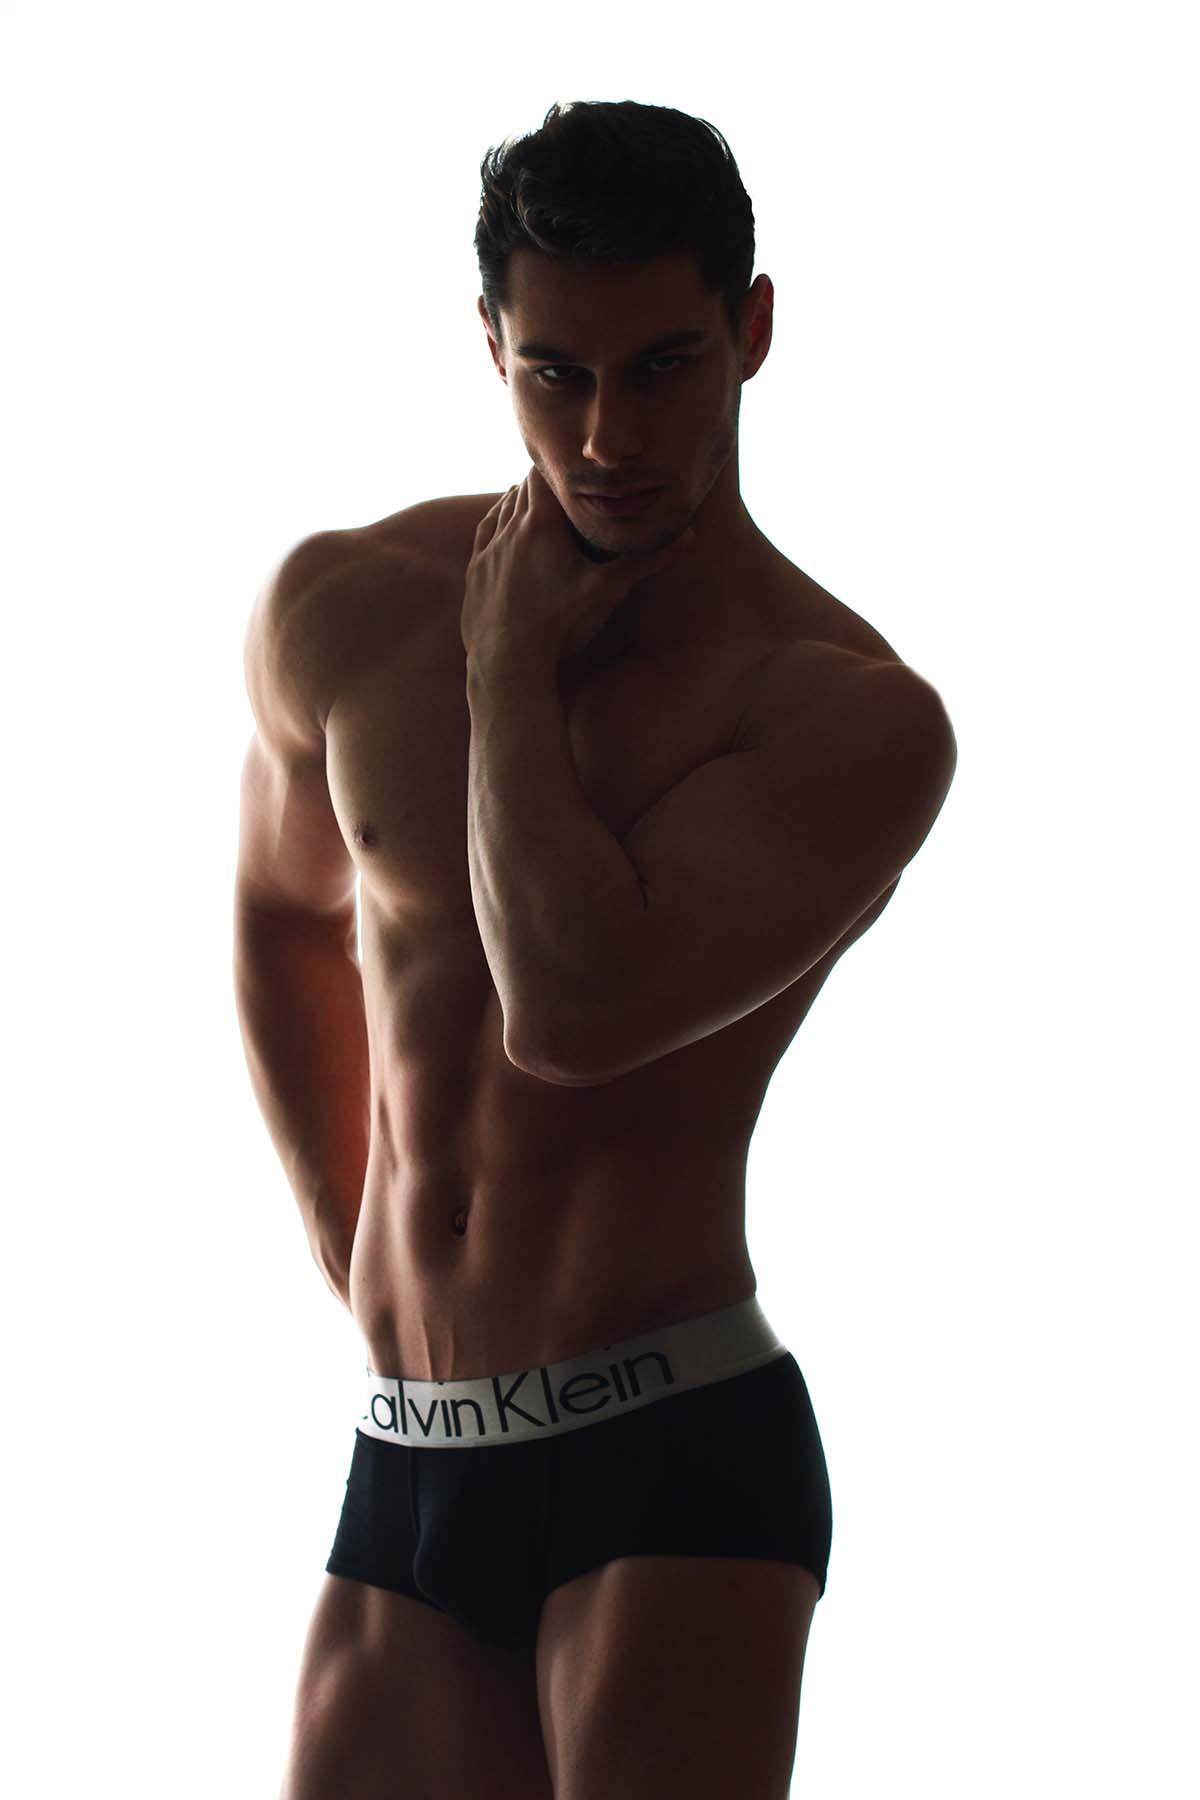 Everton Stedile by Self (Luke Grimley) for Brazilian Male Model